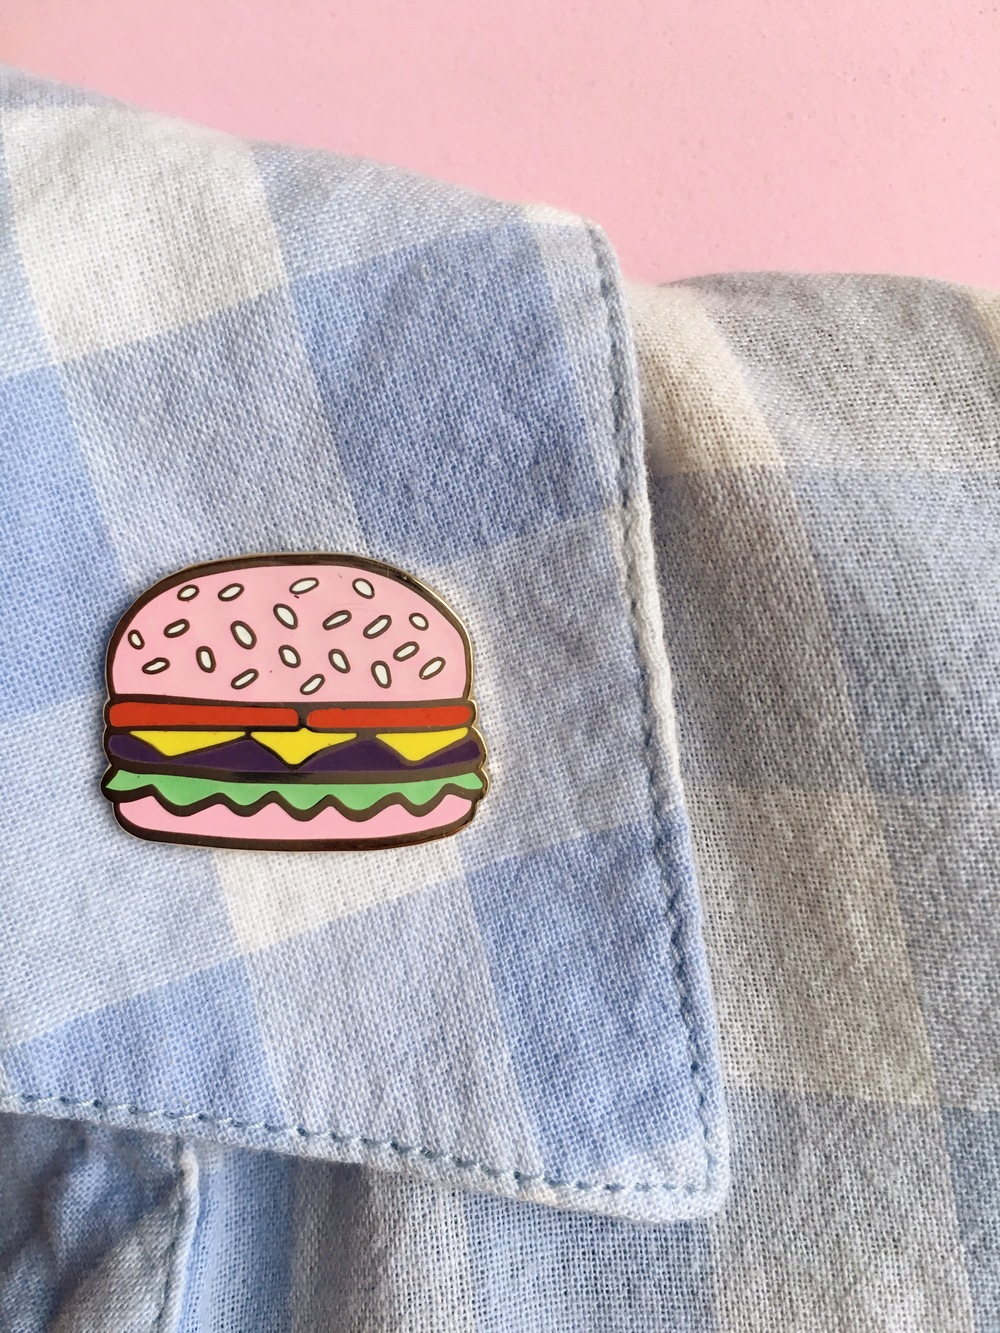 Wink Pins - Pink Burger 4.jpg